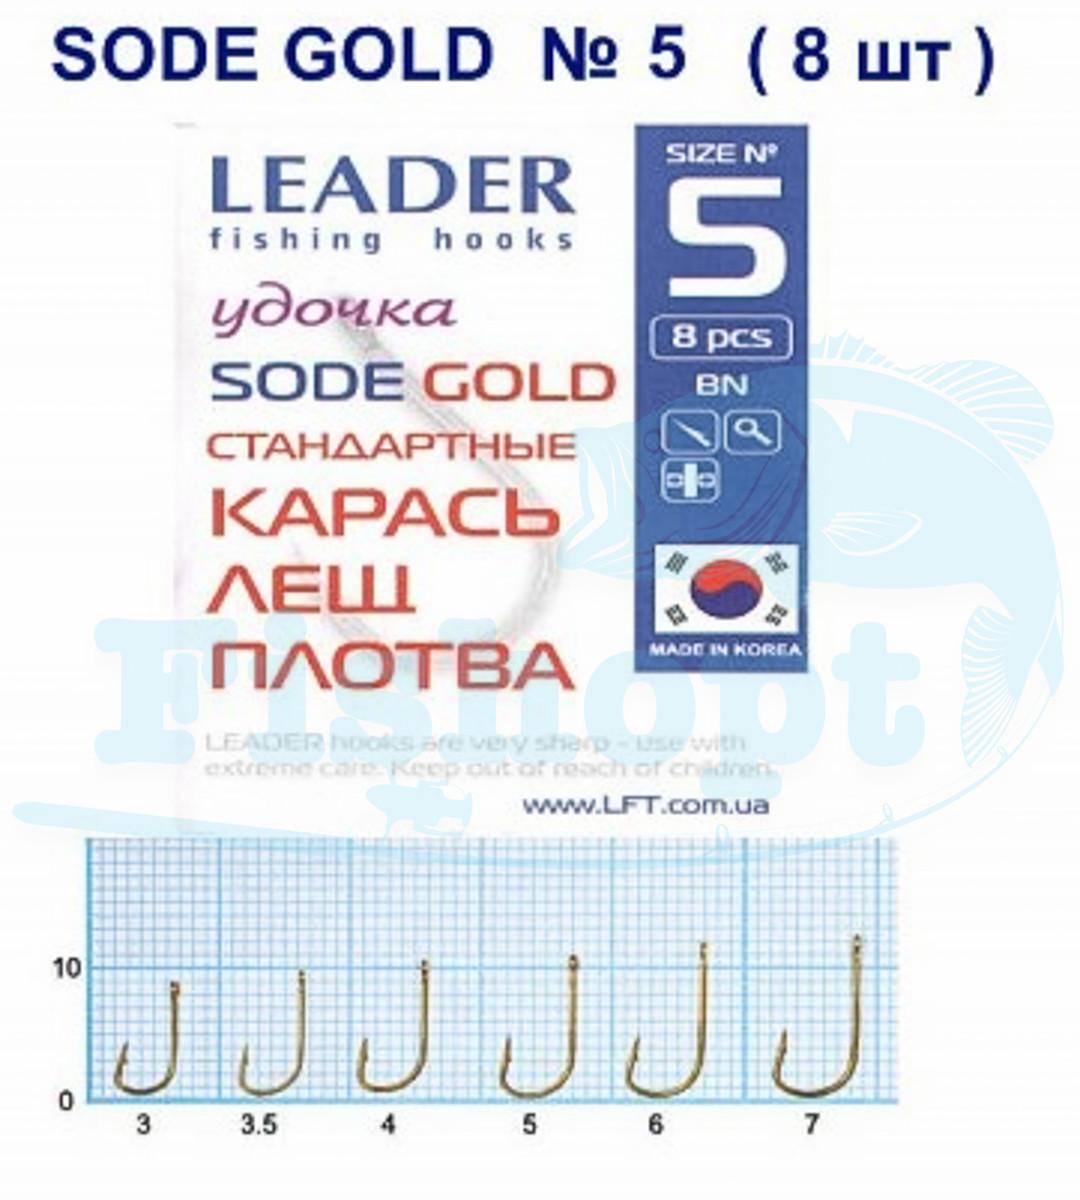 Крючок Leader Sode Gold (карась,лещ,плотва) № 5